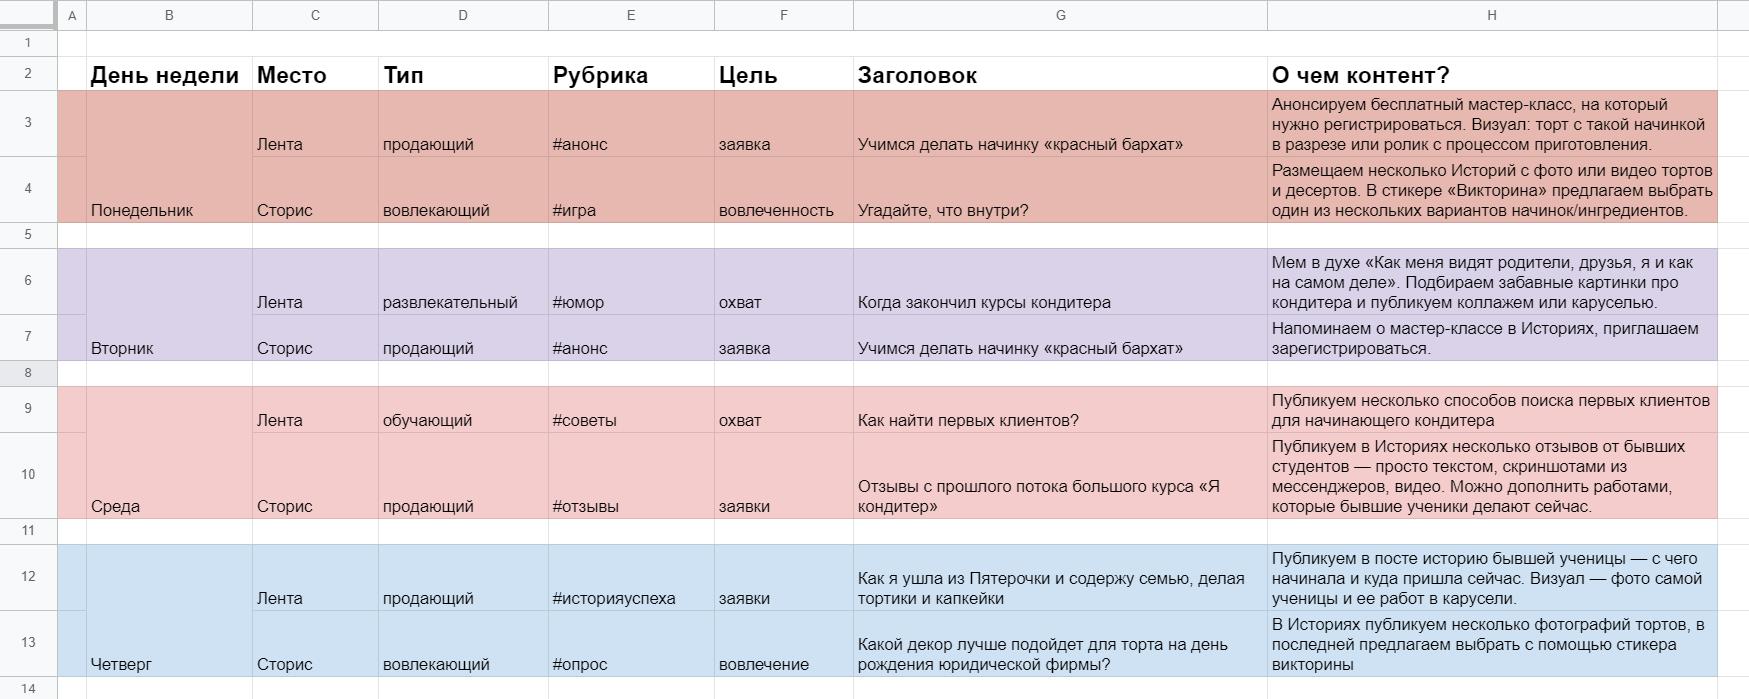 Шаблон матрицы контента в Google Таблицах